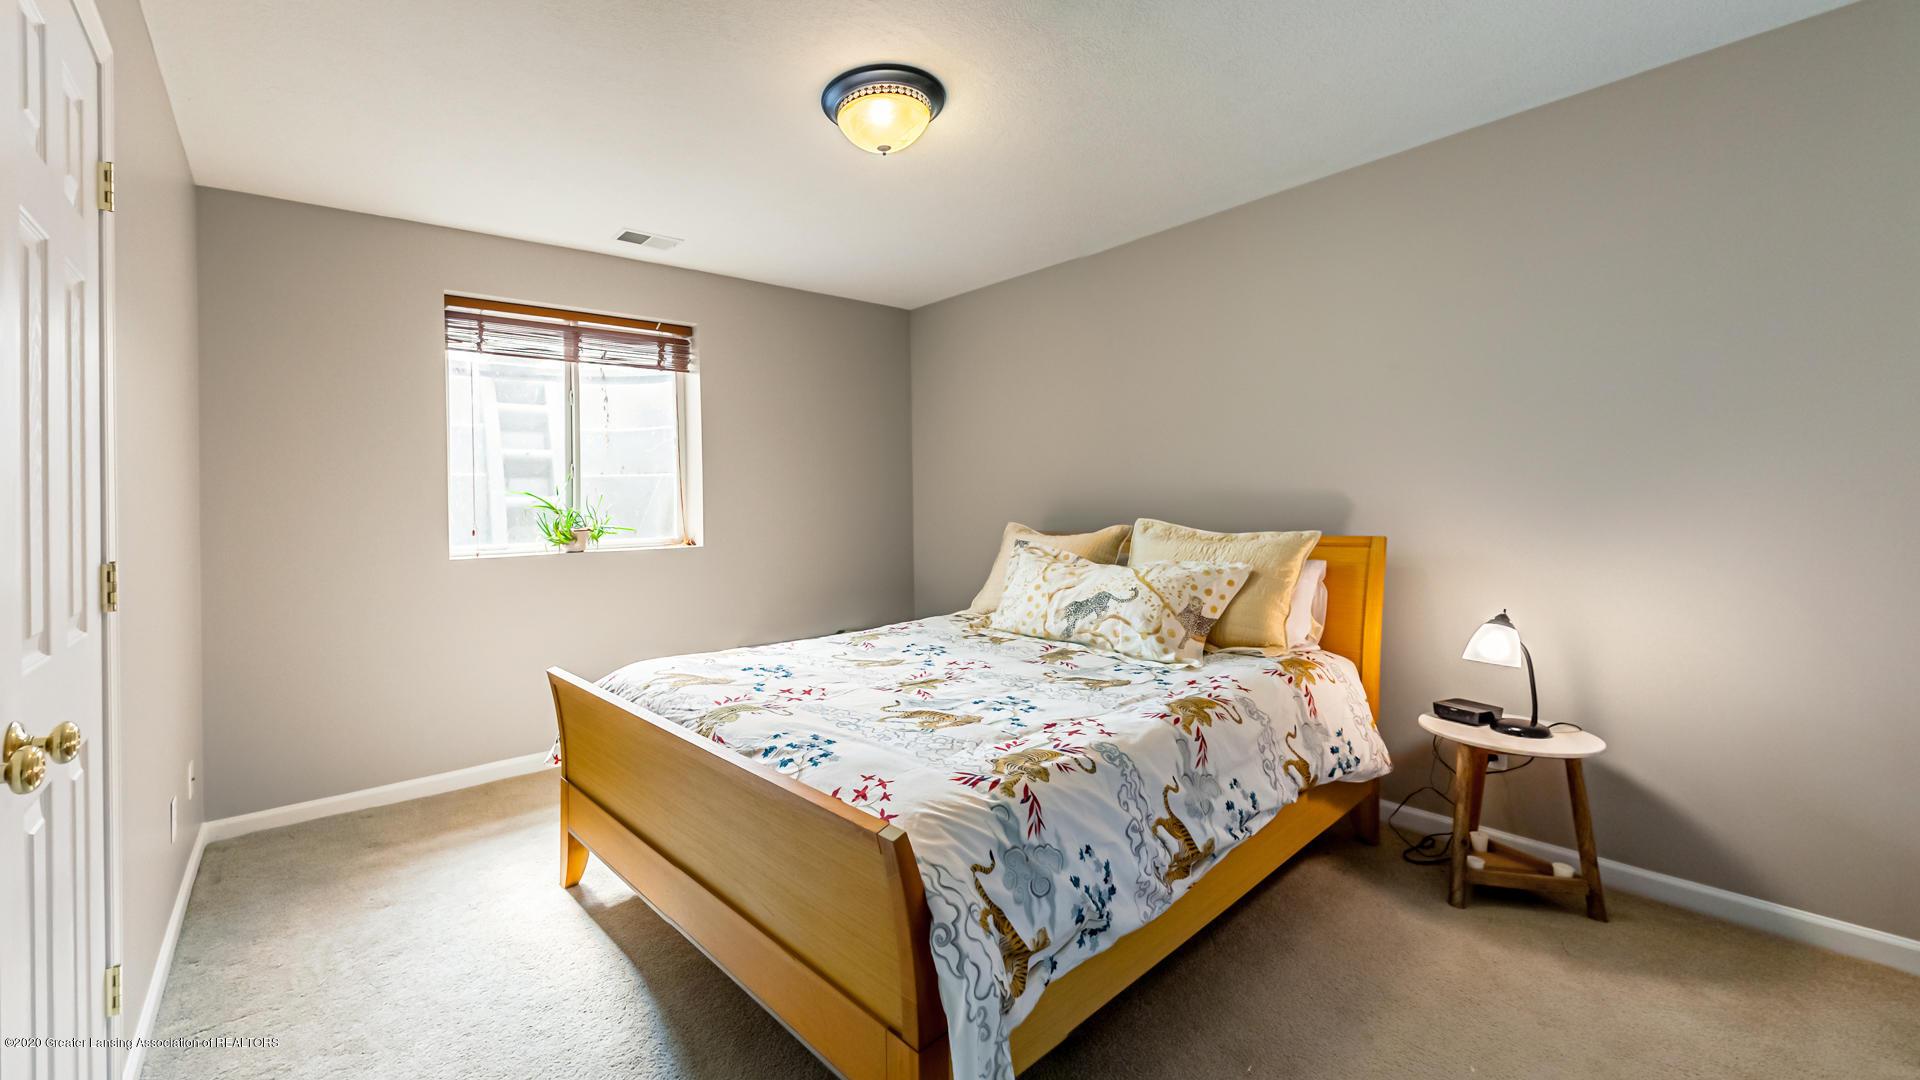 5332 Burcham Dr - Lower Level bedroom - 34